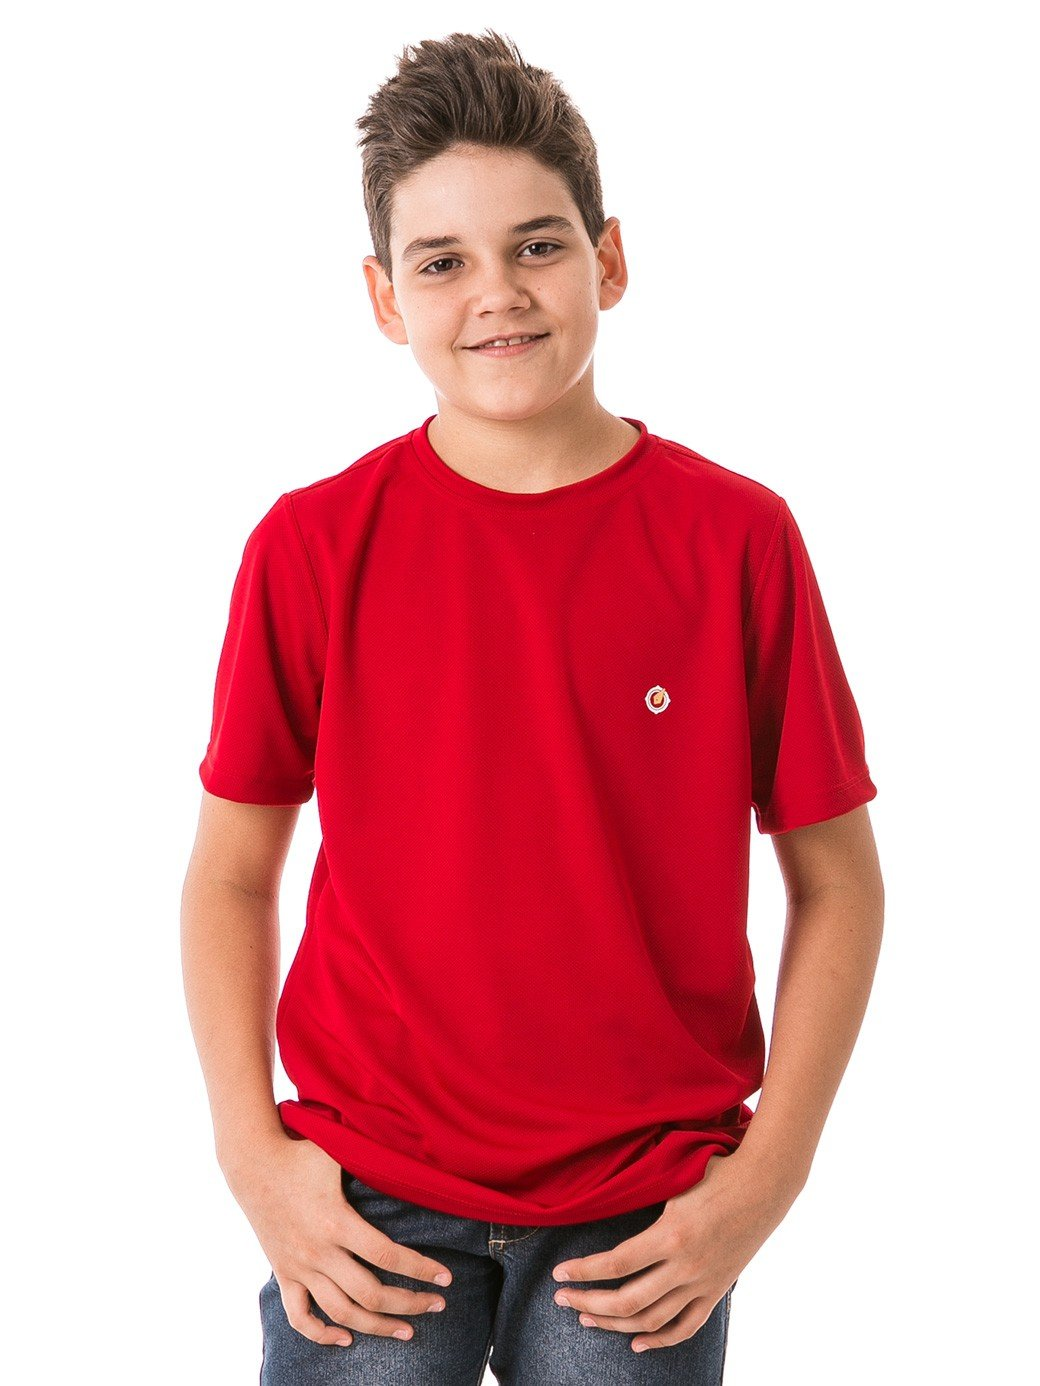 infantil masculinas t shirt curta dry vermelha frente b